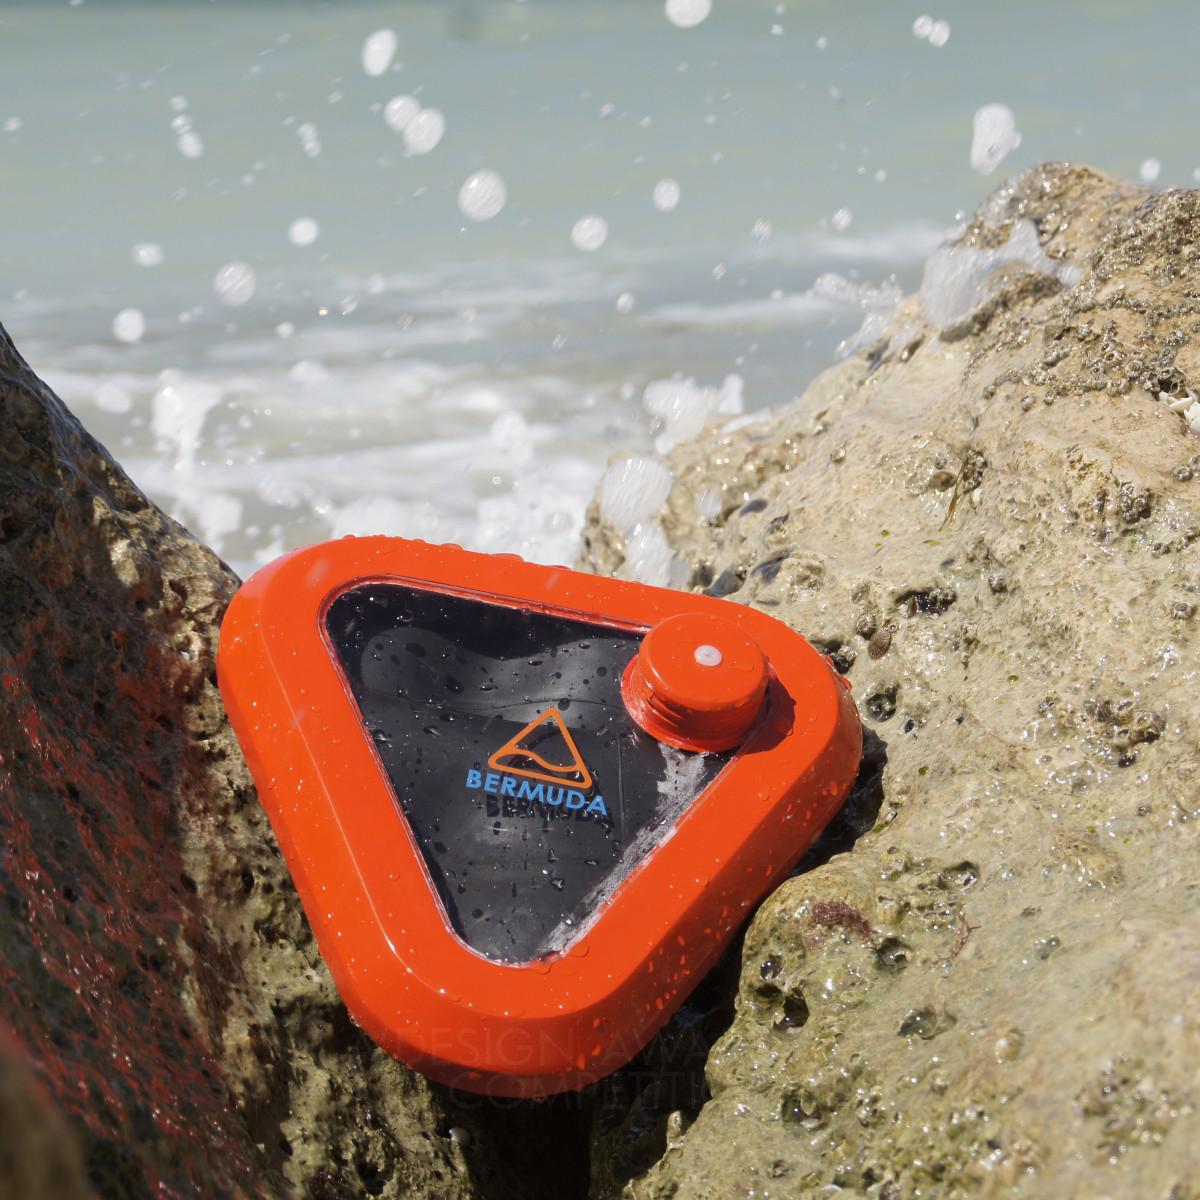 Bermuda Seawater Purifier